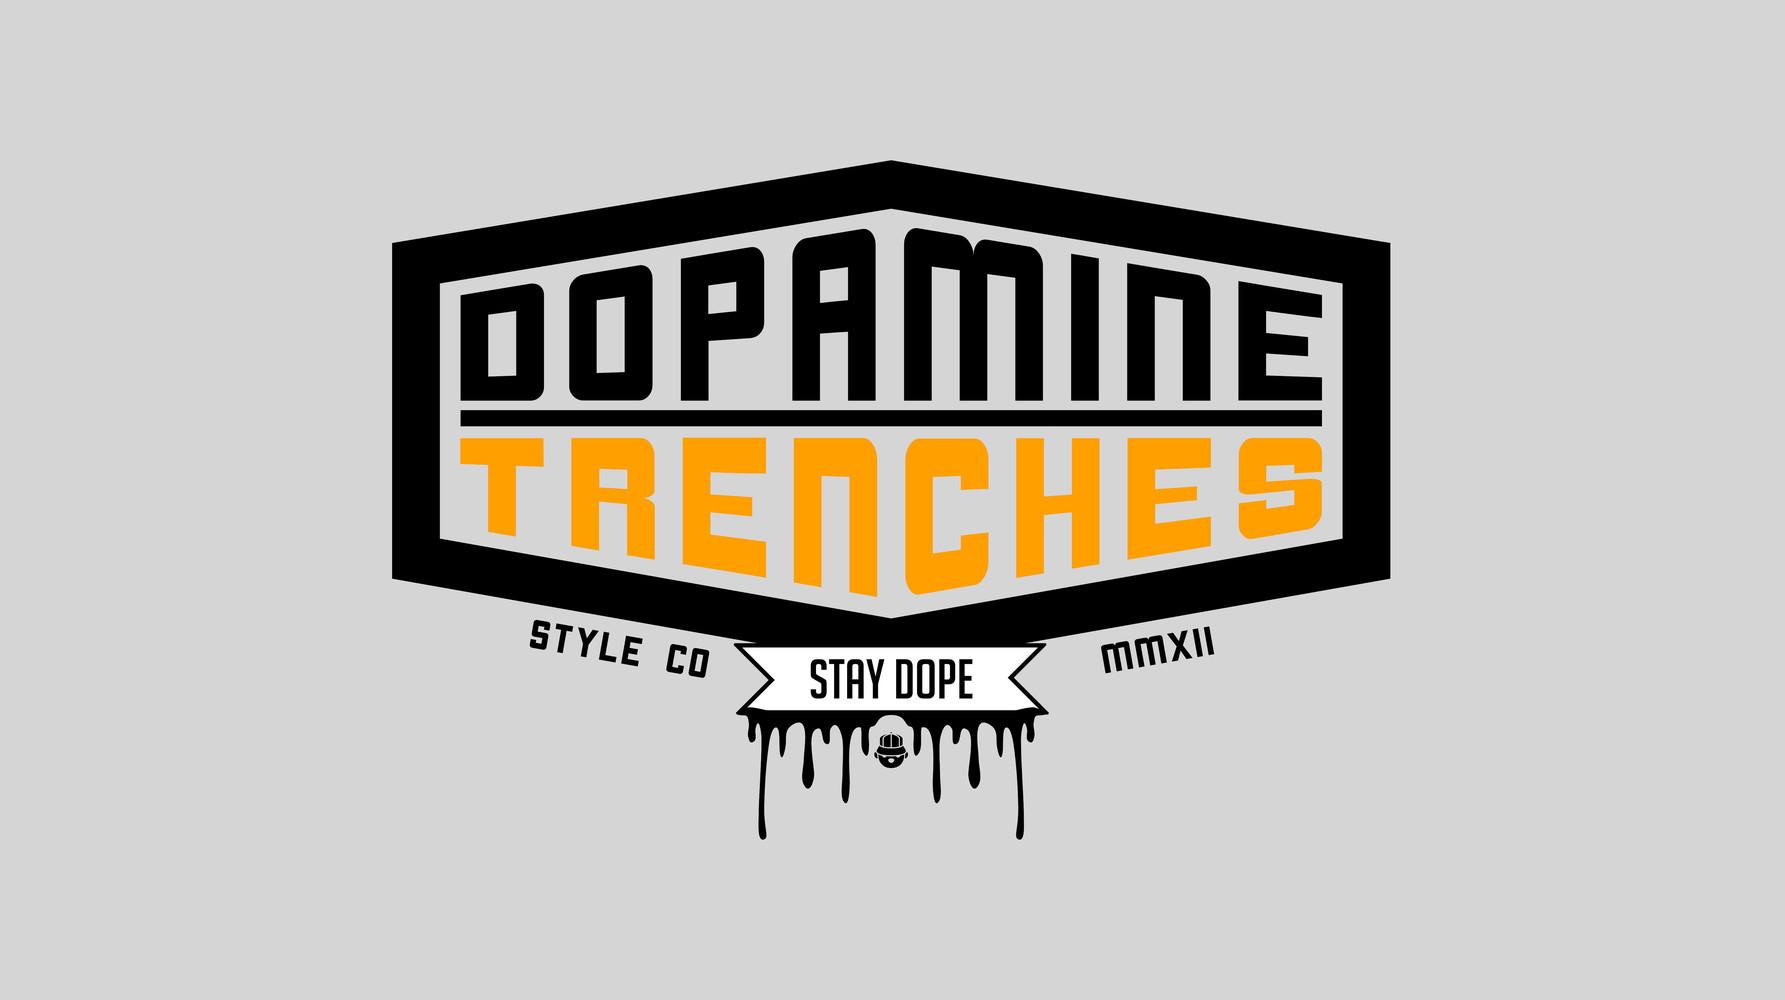 dopamine trenches